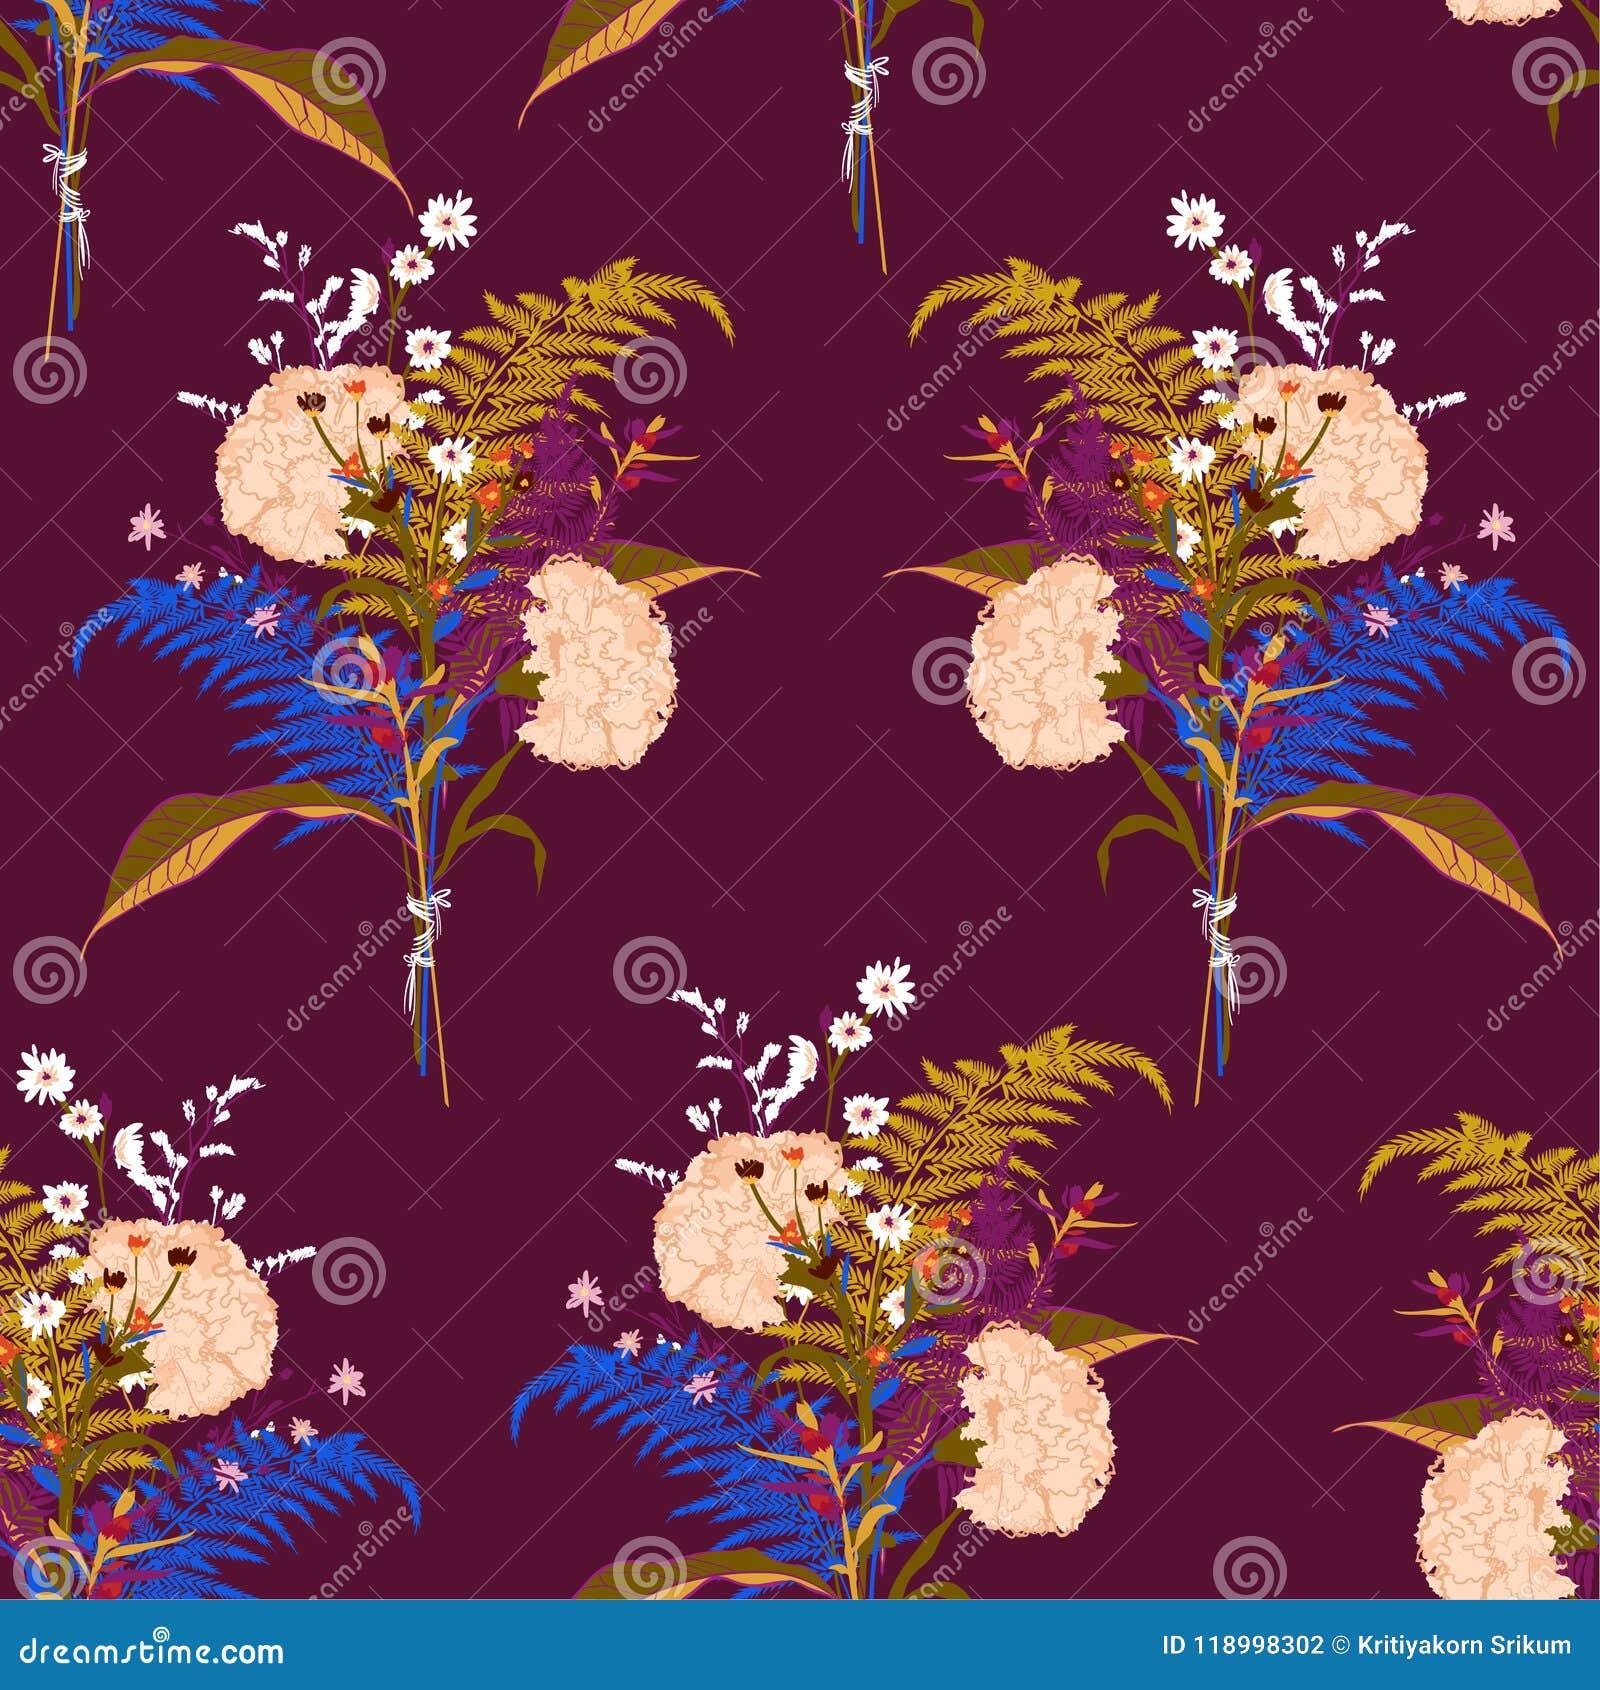 flora soft